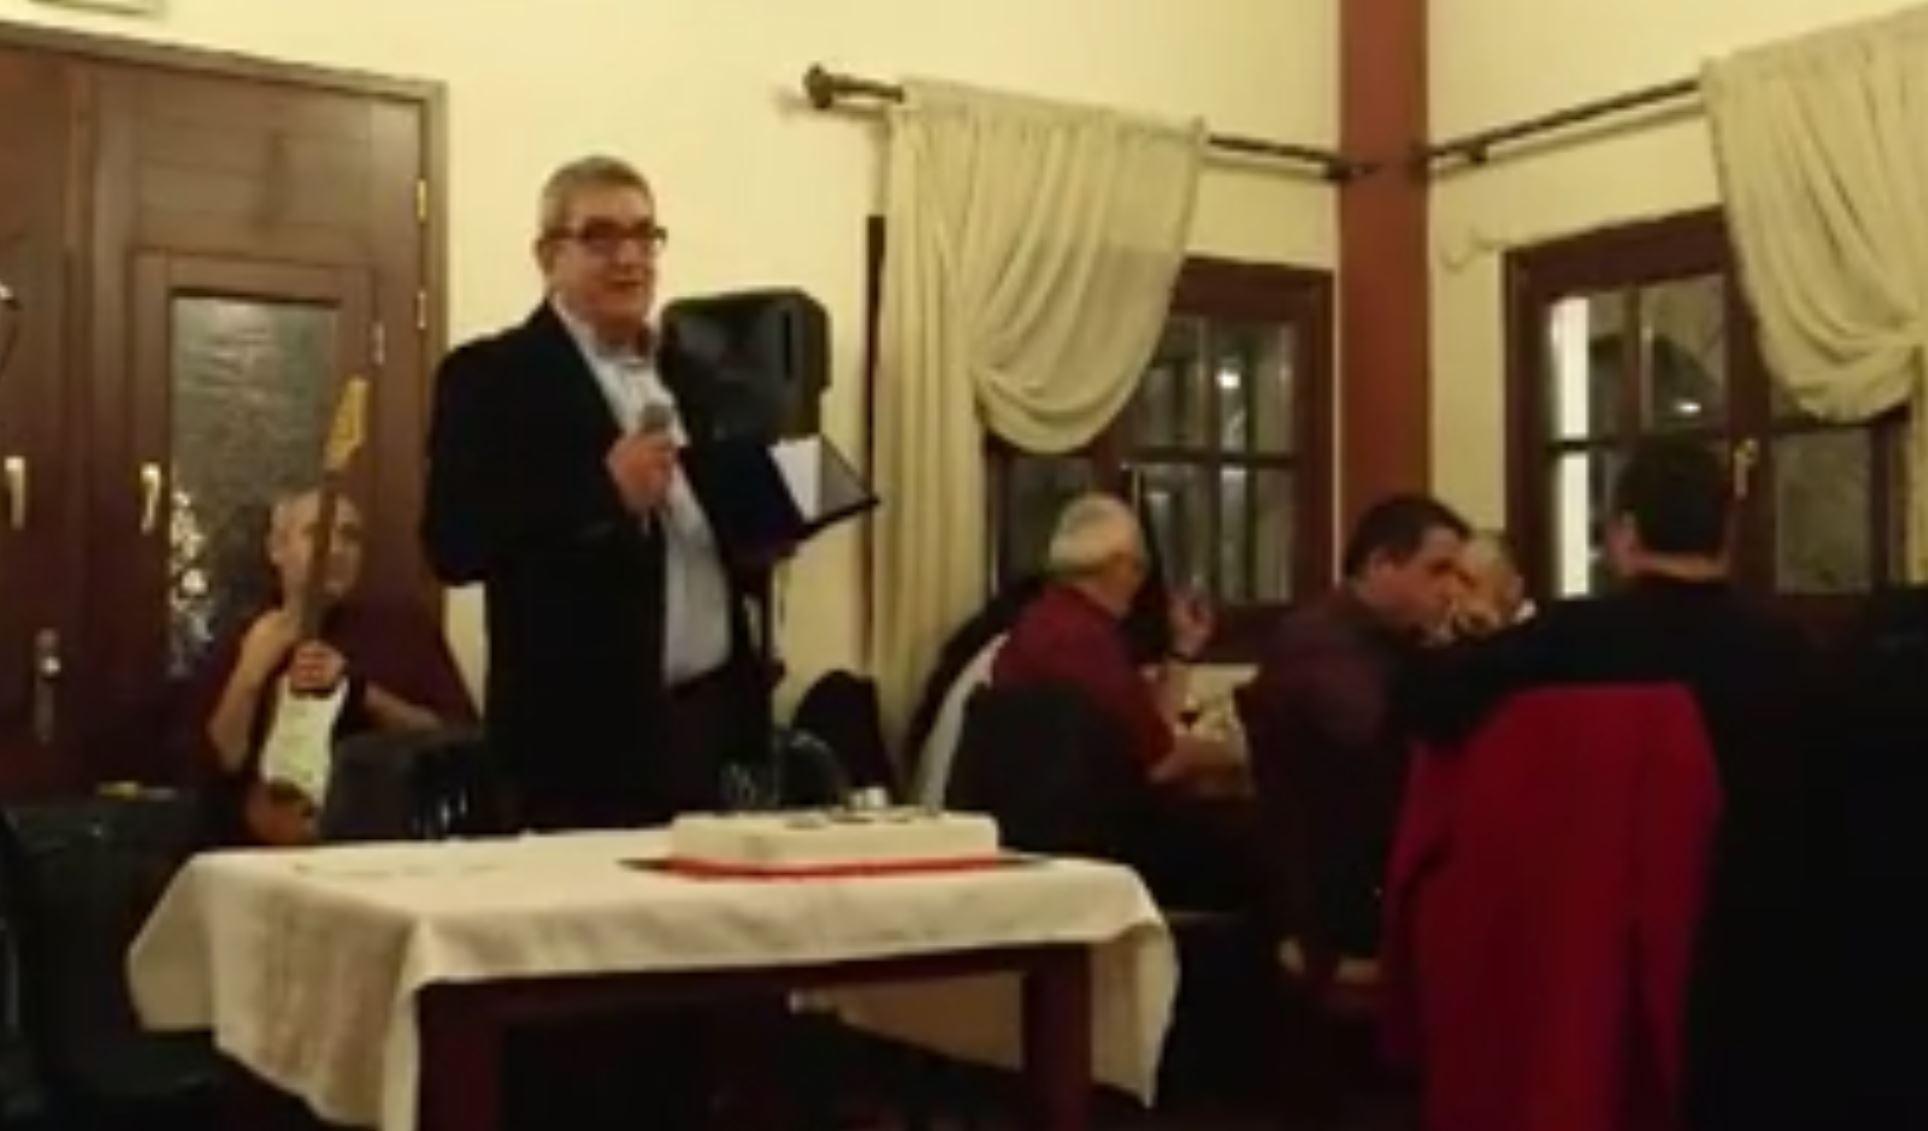 kozan.gr: Συνάθροιση, κοπή πίτας & γνωριμία του Δ.Σ. της Π.Ο.Π. Ε.Κ.Α.Β. με το νέο Διευθυντή του ΕΚΑΒ Δυτικής Μακεδονίας, Μιχάλη Δουλγεράκη – Tιμήθηκε ο απερχόμενος (διευθυντής) Παπαγγελής Δημήτρης – Ποιο το παράπoνό του κ. Παπαγγελή και τι συμβούλεψε τον αντικαταστάτη του (Βίντεο & Φωτογραφίες)